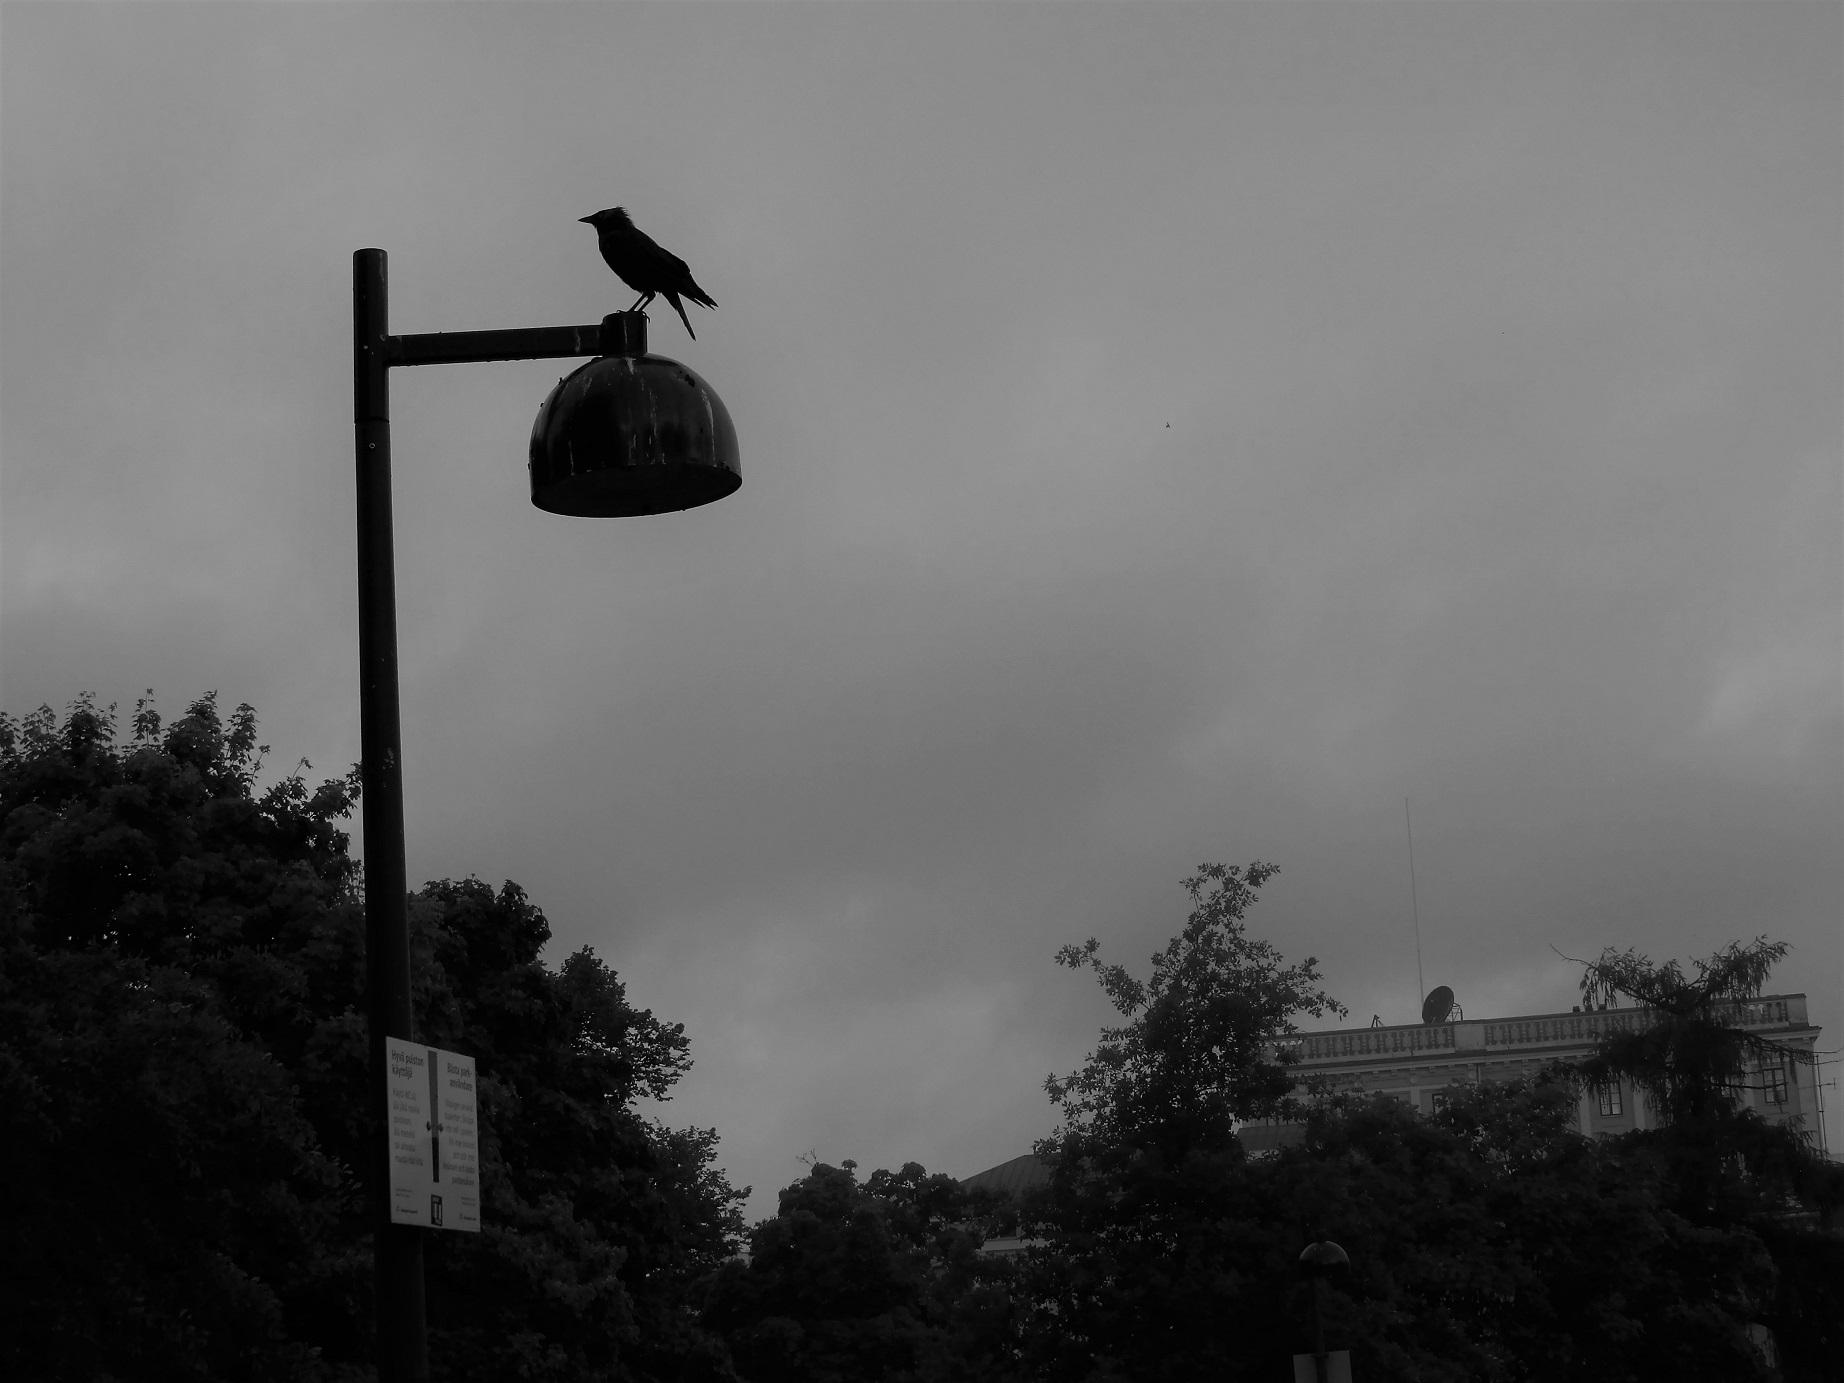 Nimi: Lintu lampulla, Kuvaaja: Tarja Kaltiomaa